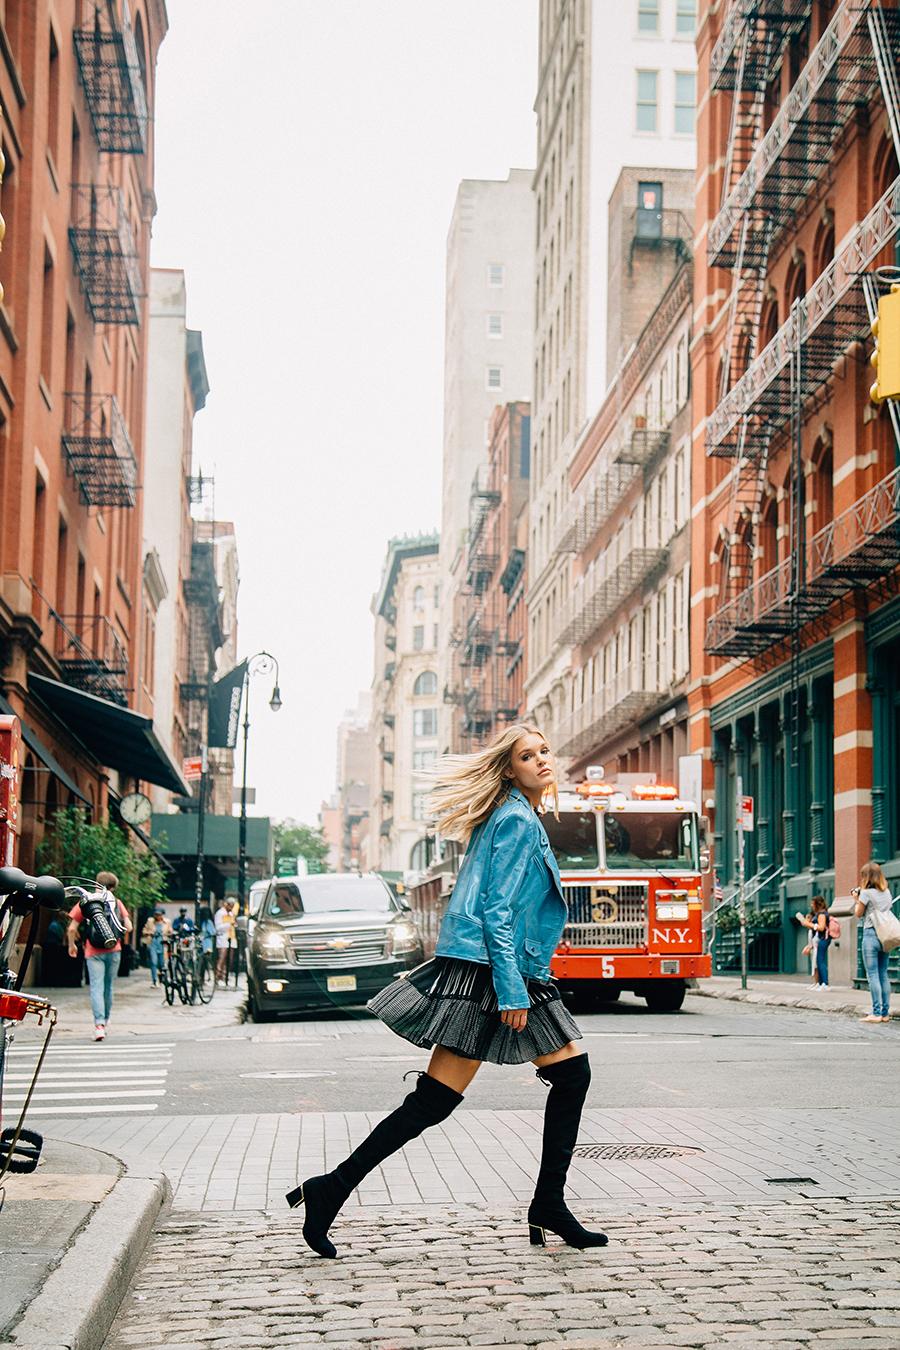 STACCATO_FW18_NY_Street_FP9A6017_COMP.jpg